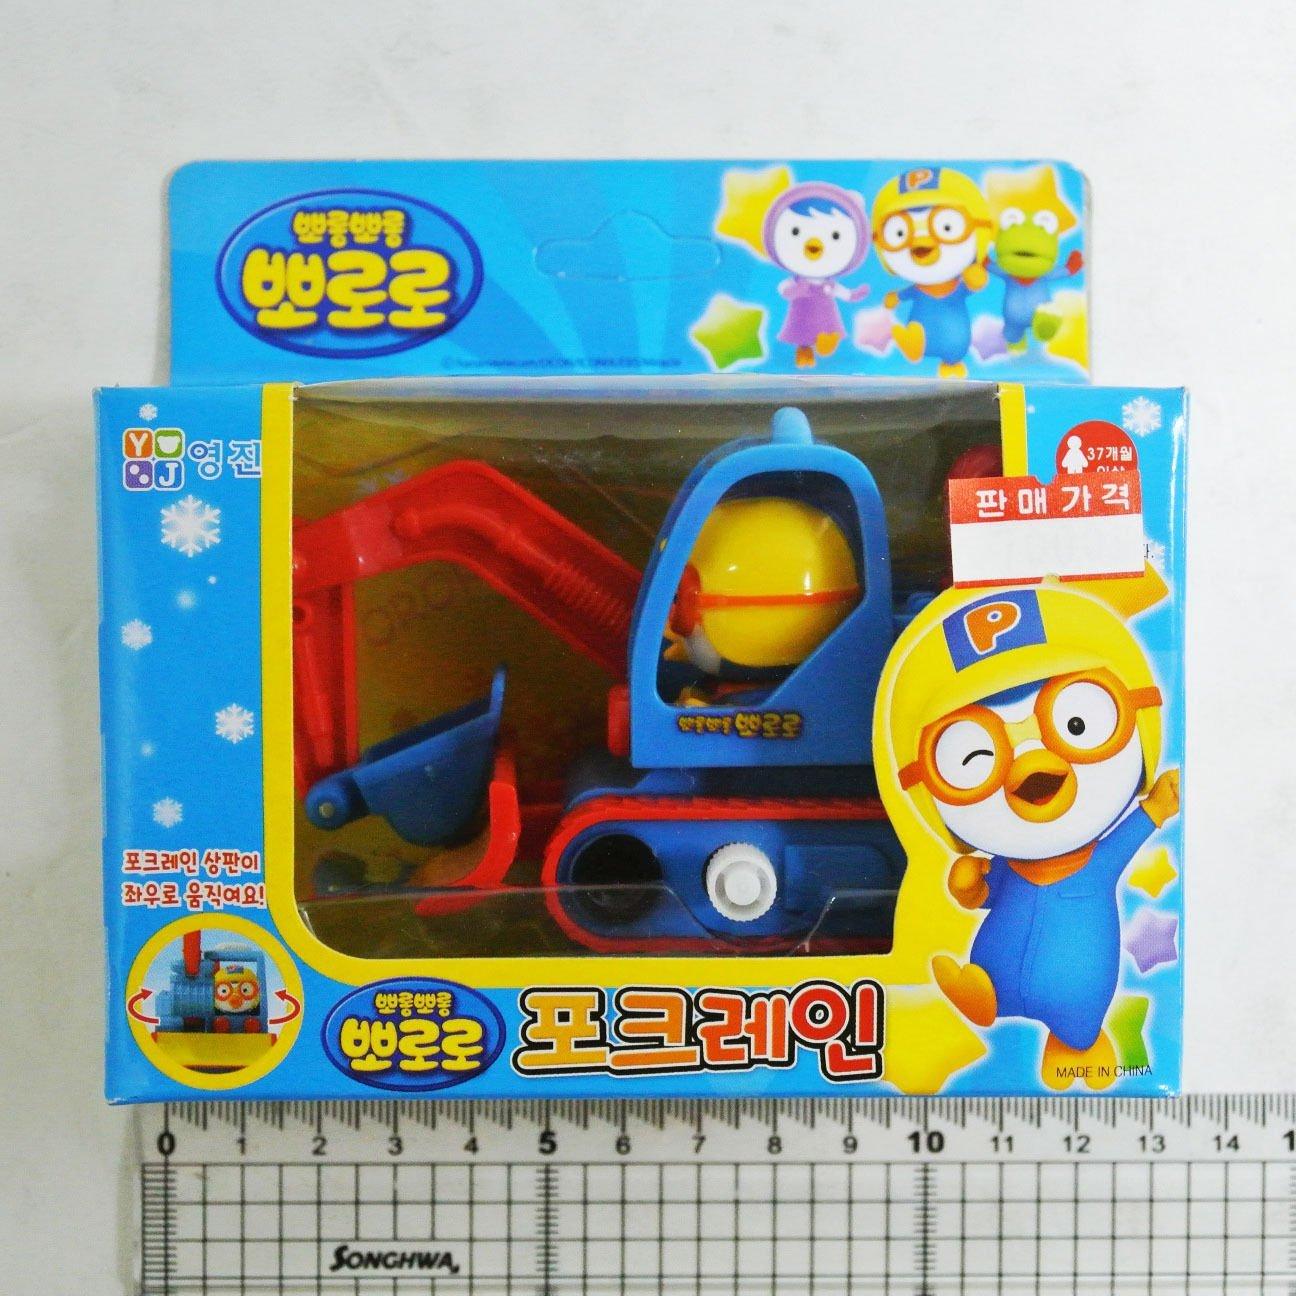 Children Kids Gift Toy Pororo Mini Car Excavator Poclain Korean Animation /ITEM#G839GJ UY-W8EHF3130549